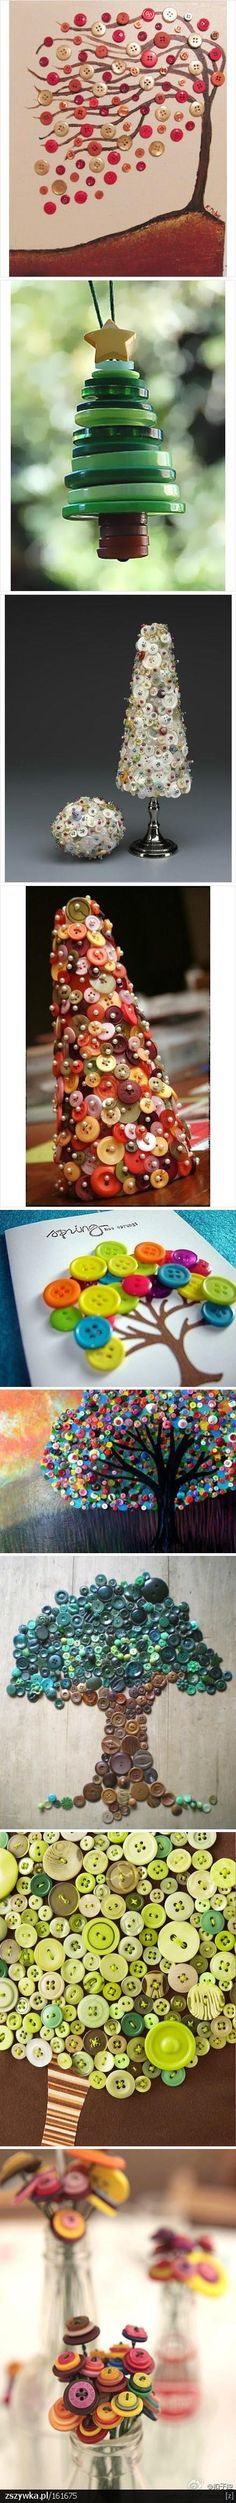 Amazing Button Art                                                                                                                                                                                 Más